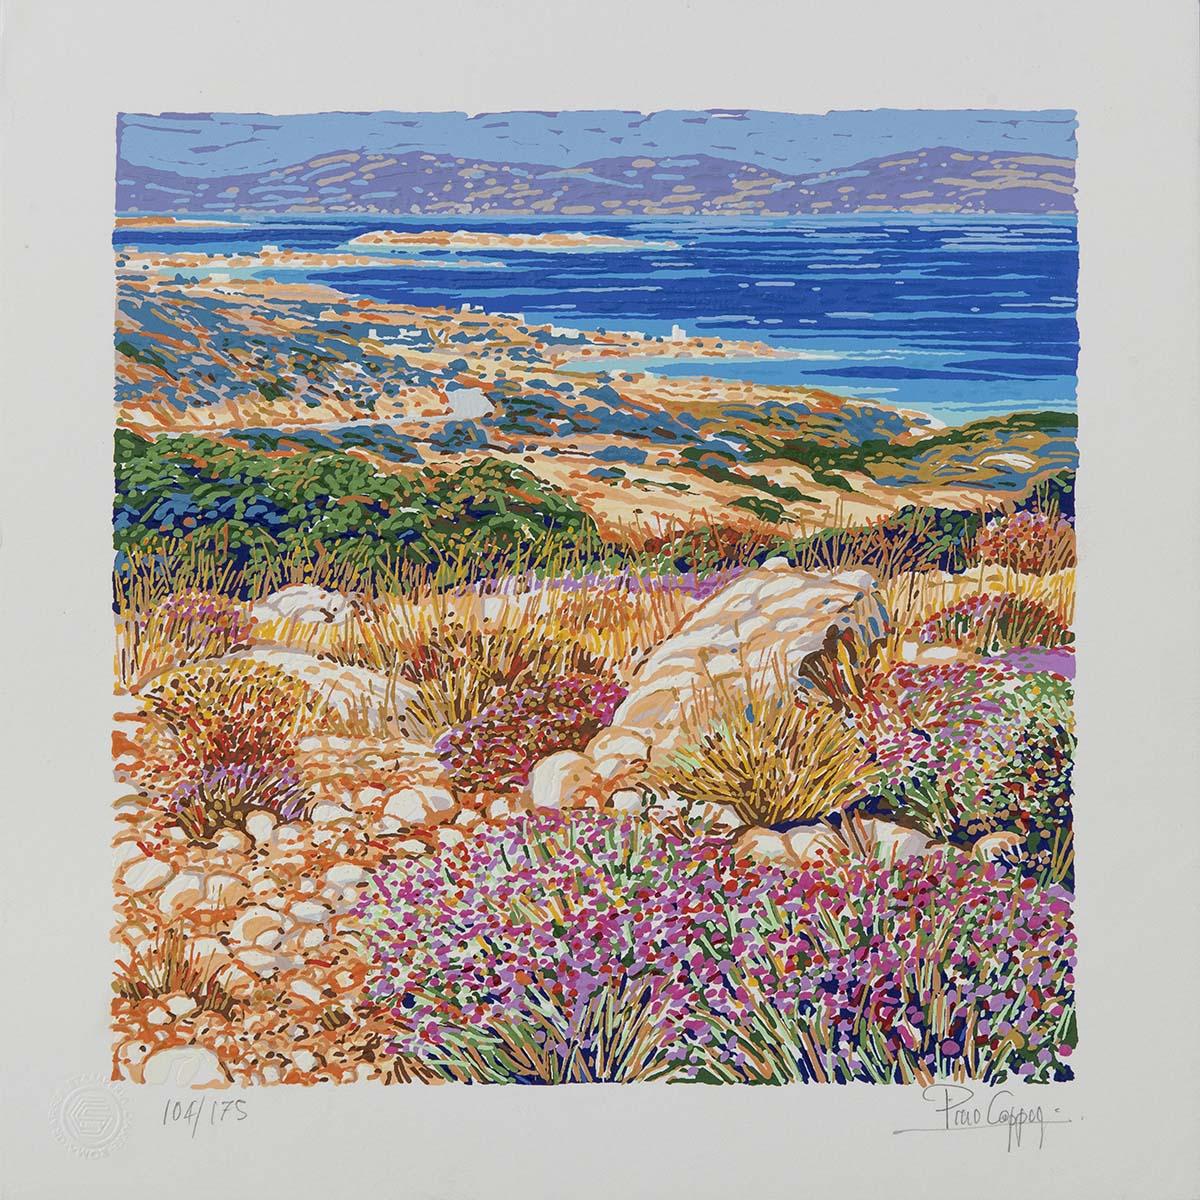 Pino Cappugi – Panorama A Paros – Serigrafia Polimaterica 25×25